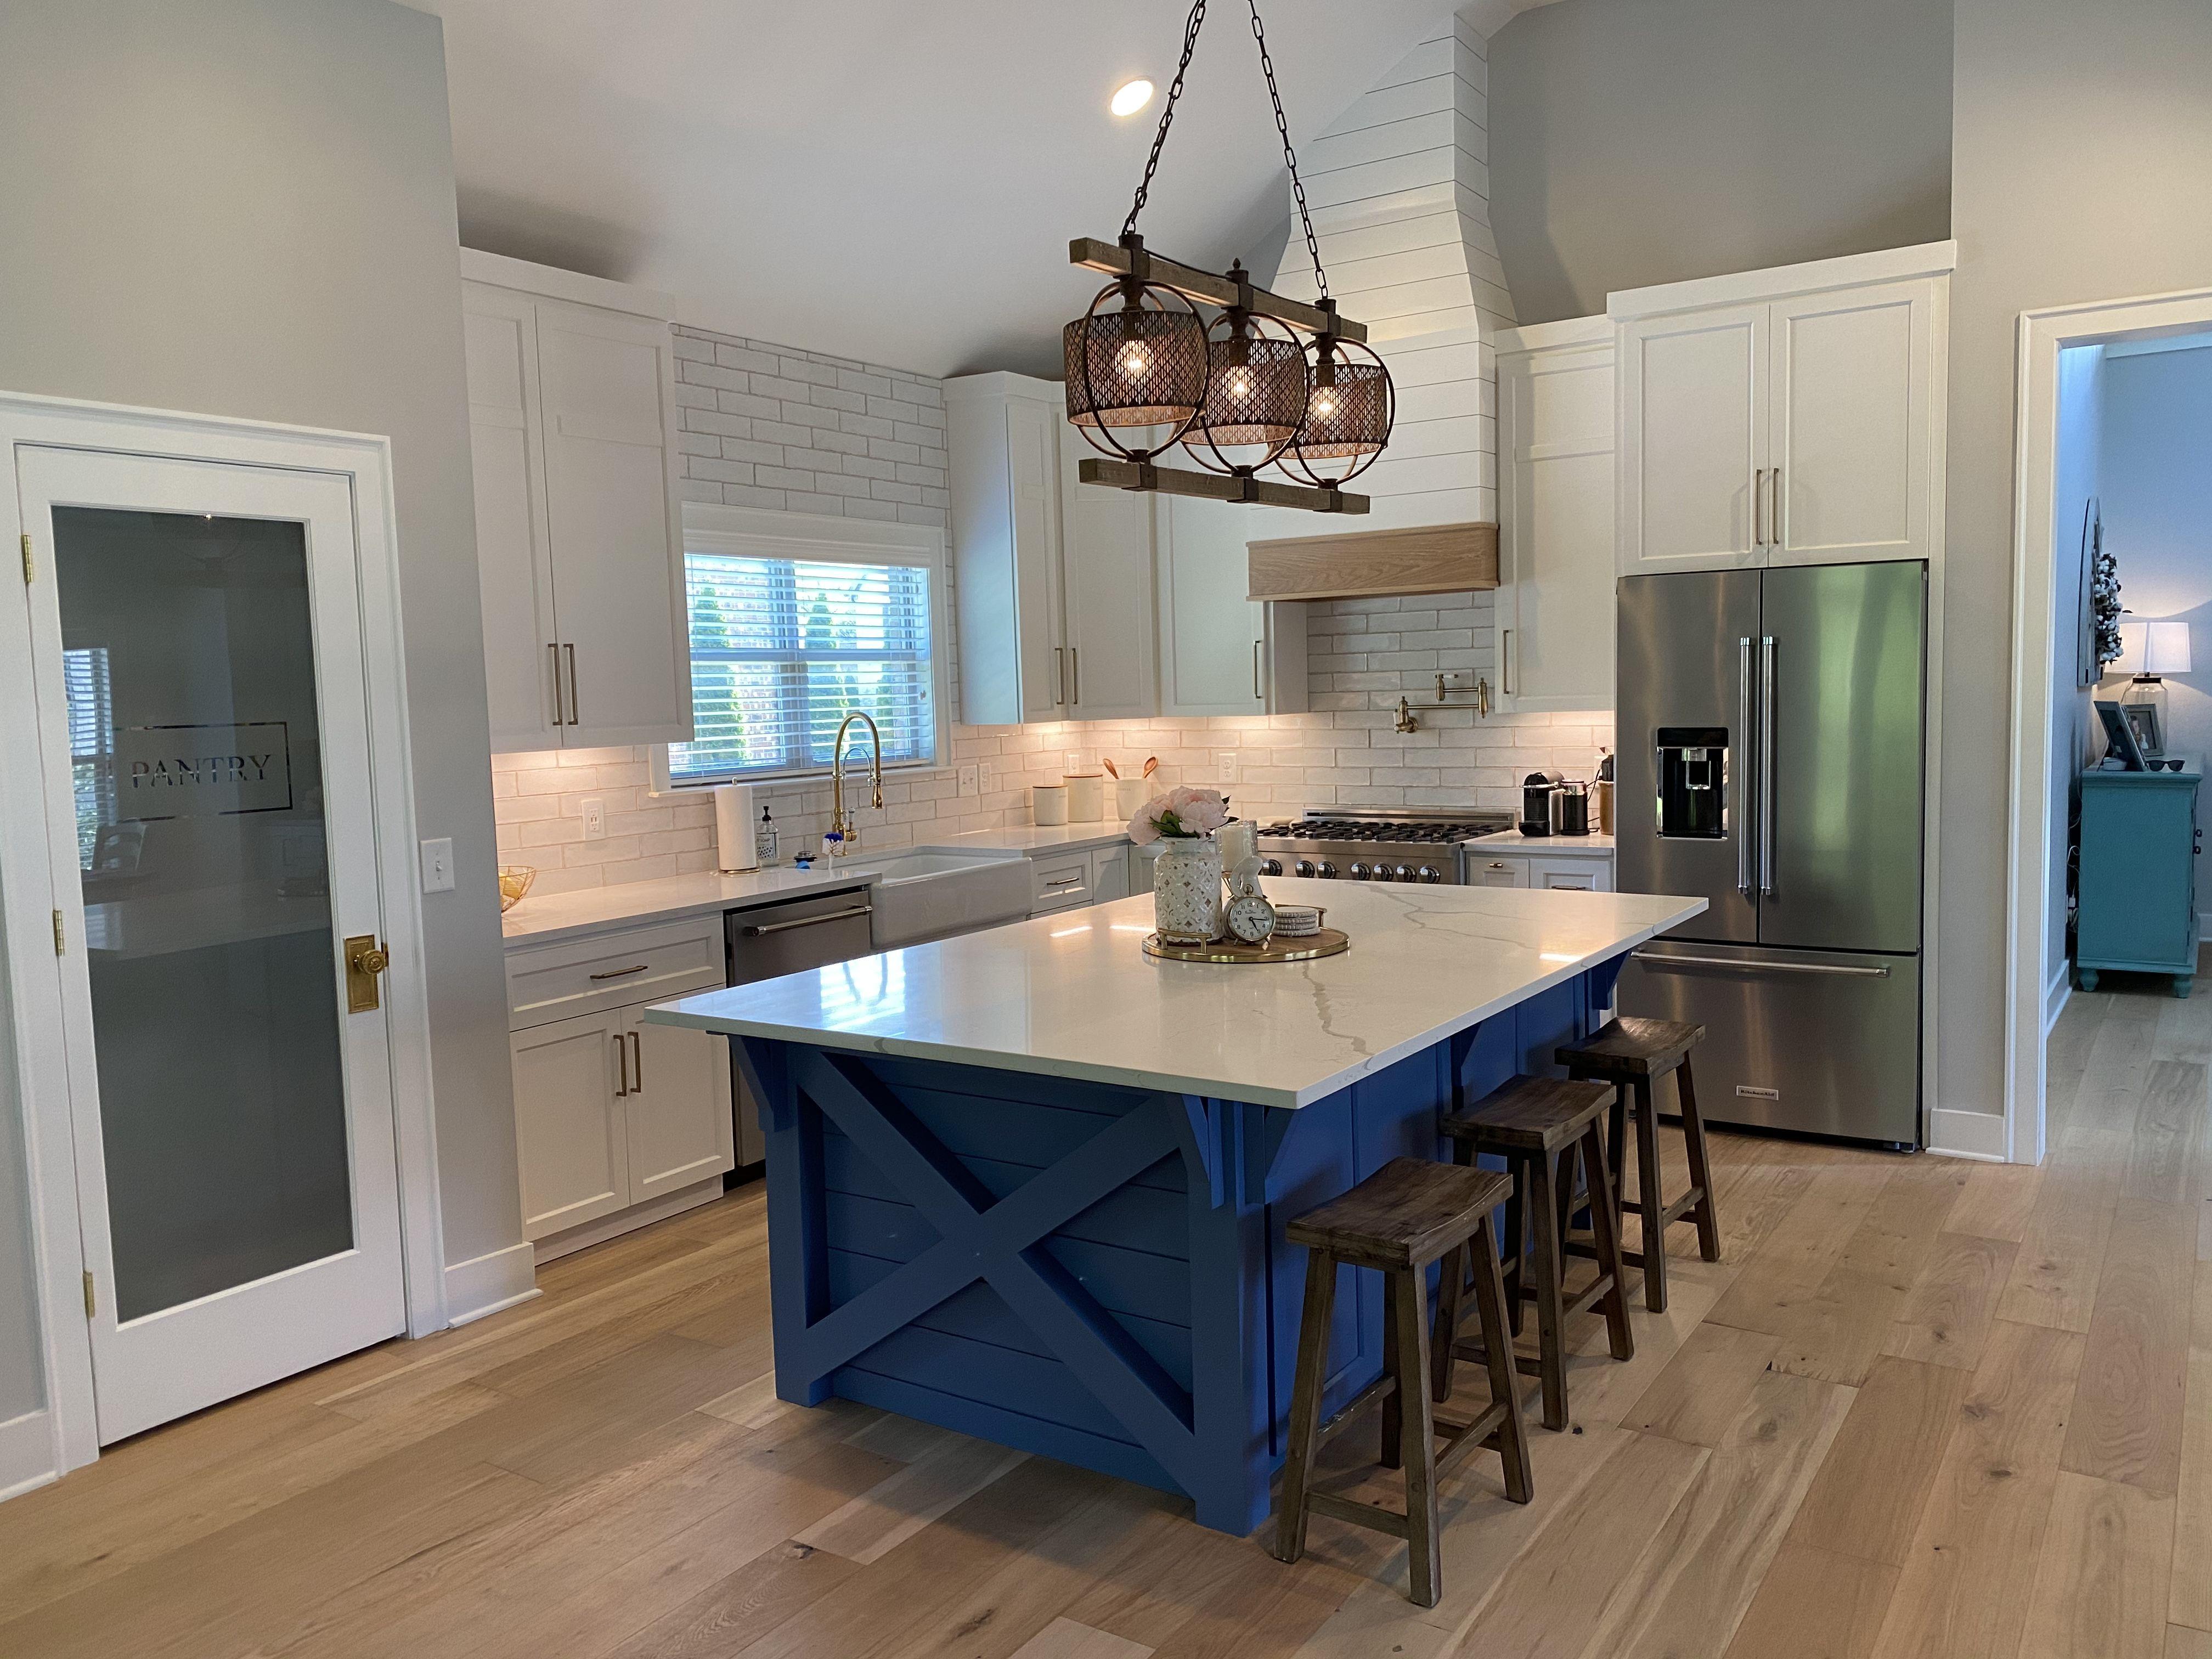 Farmhouse kitchen in 2020 farmhouse kitchen kitchen